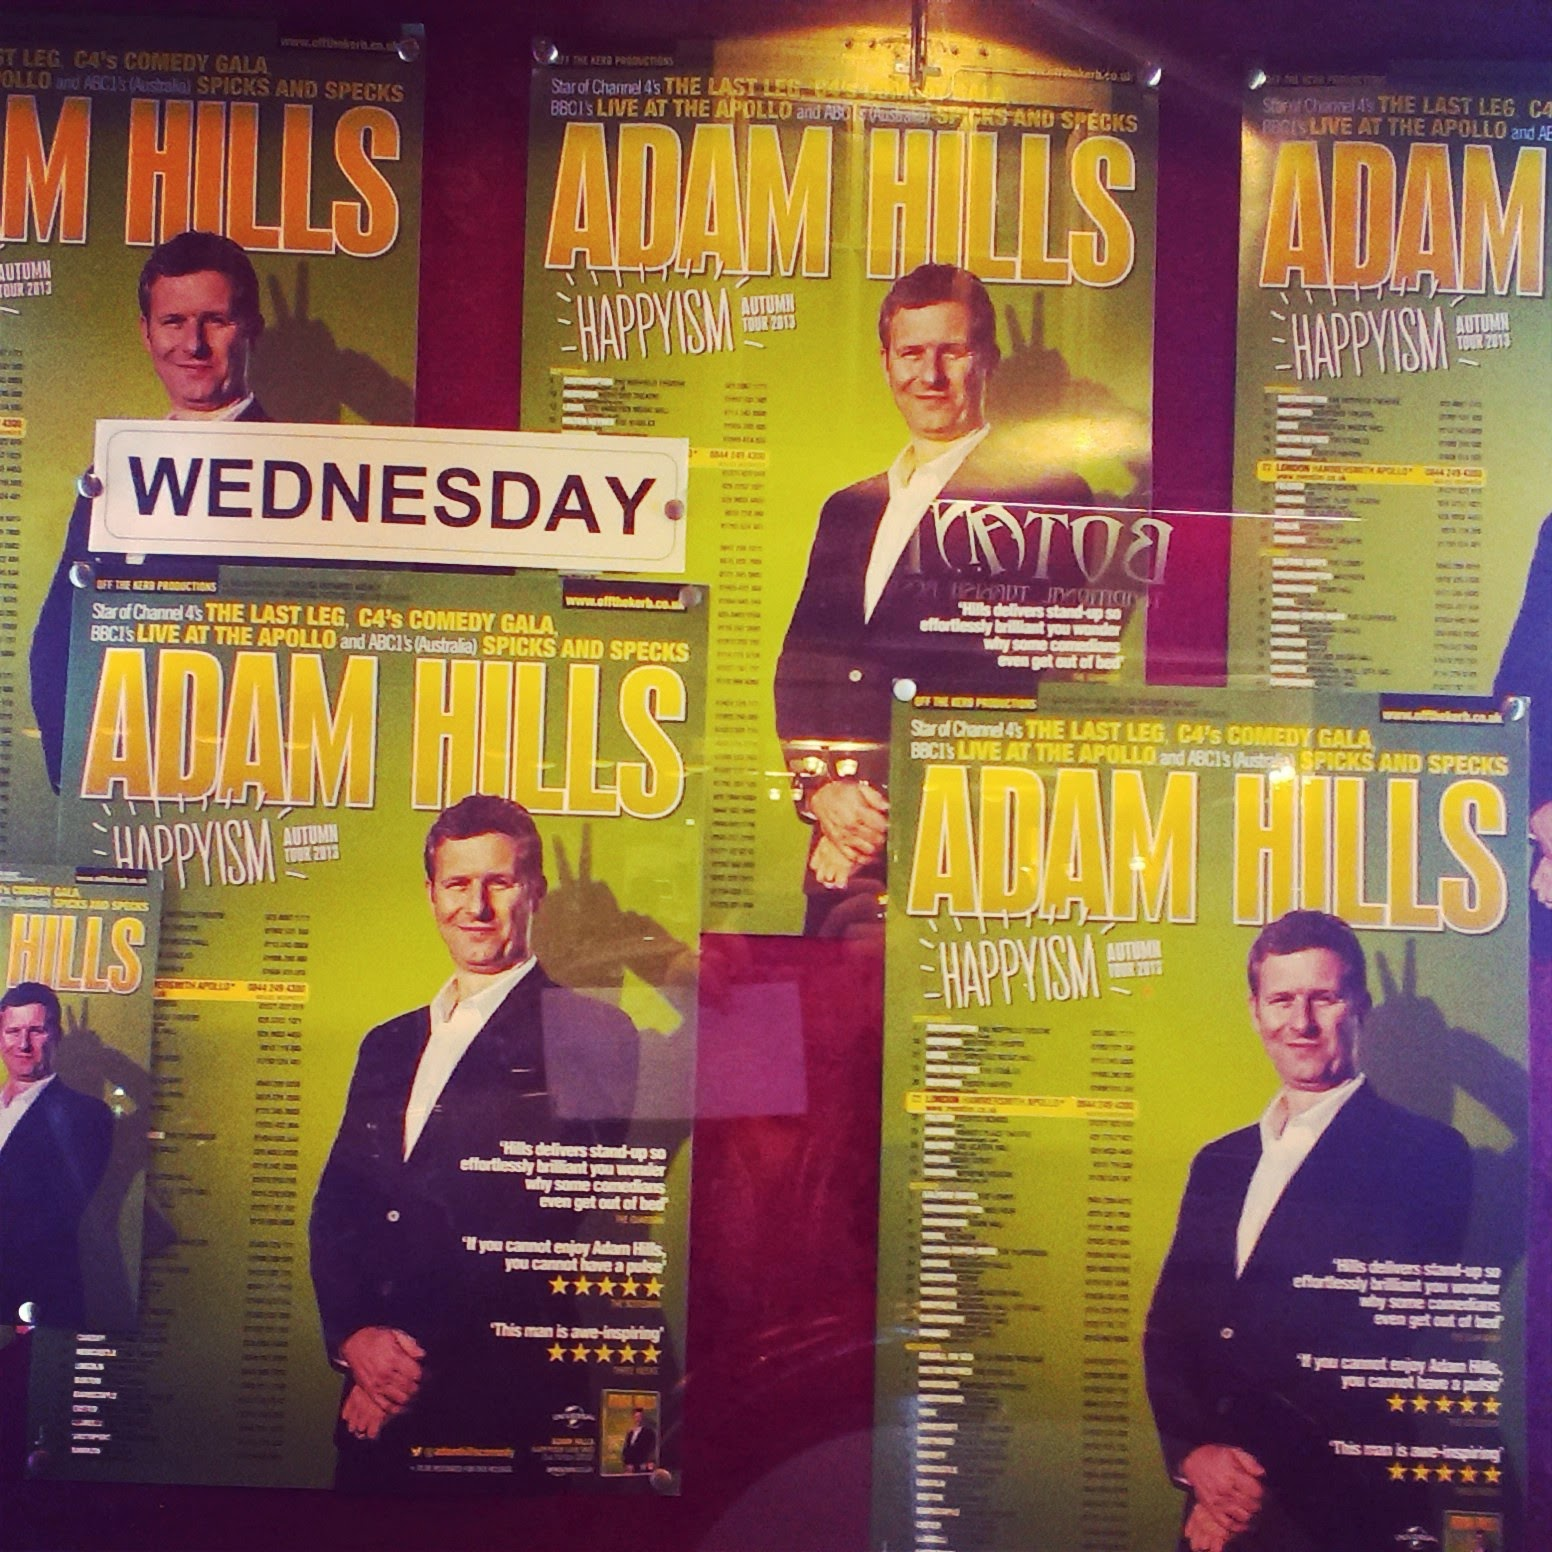 Adam Hills Happyism Tour Posters